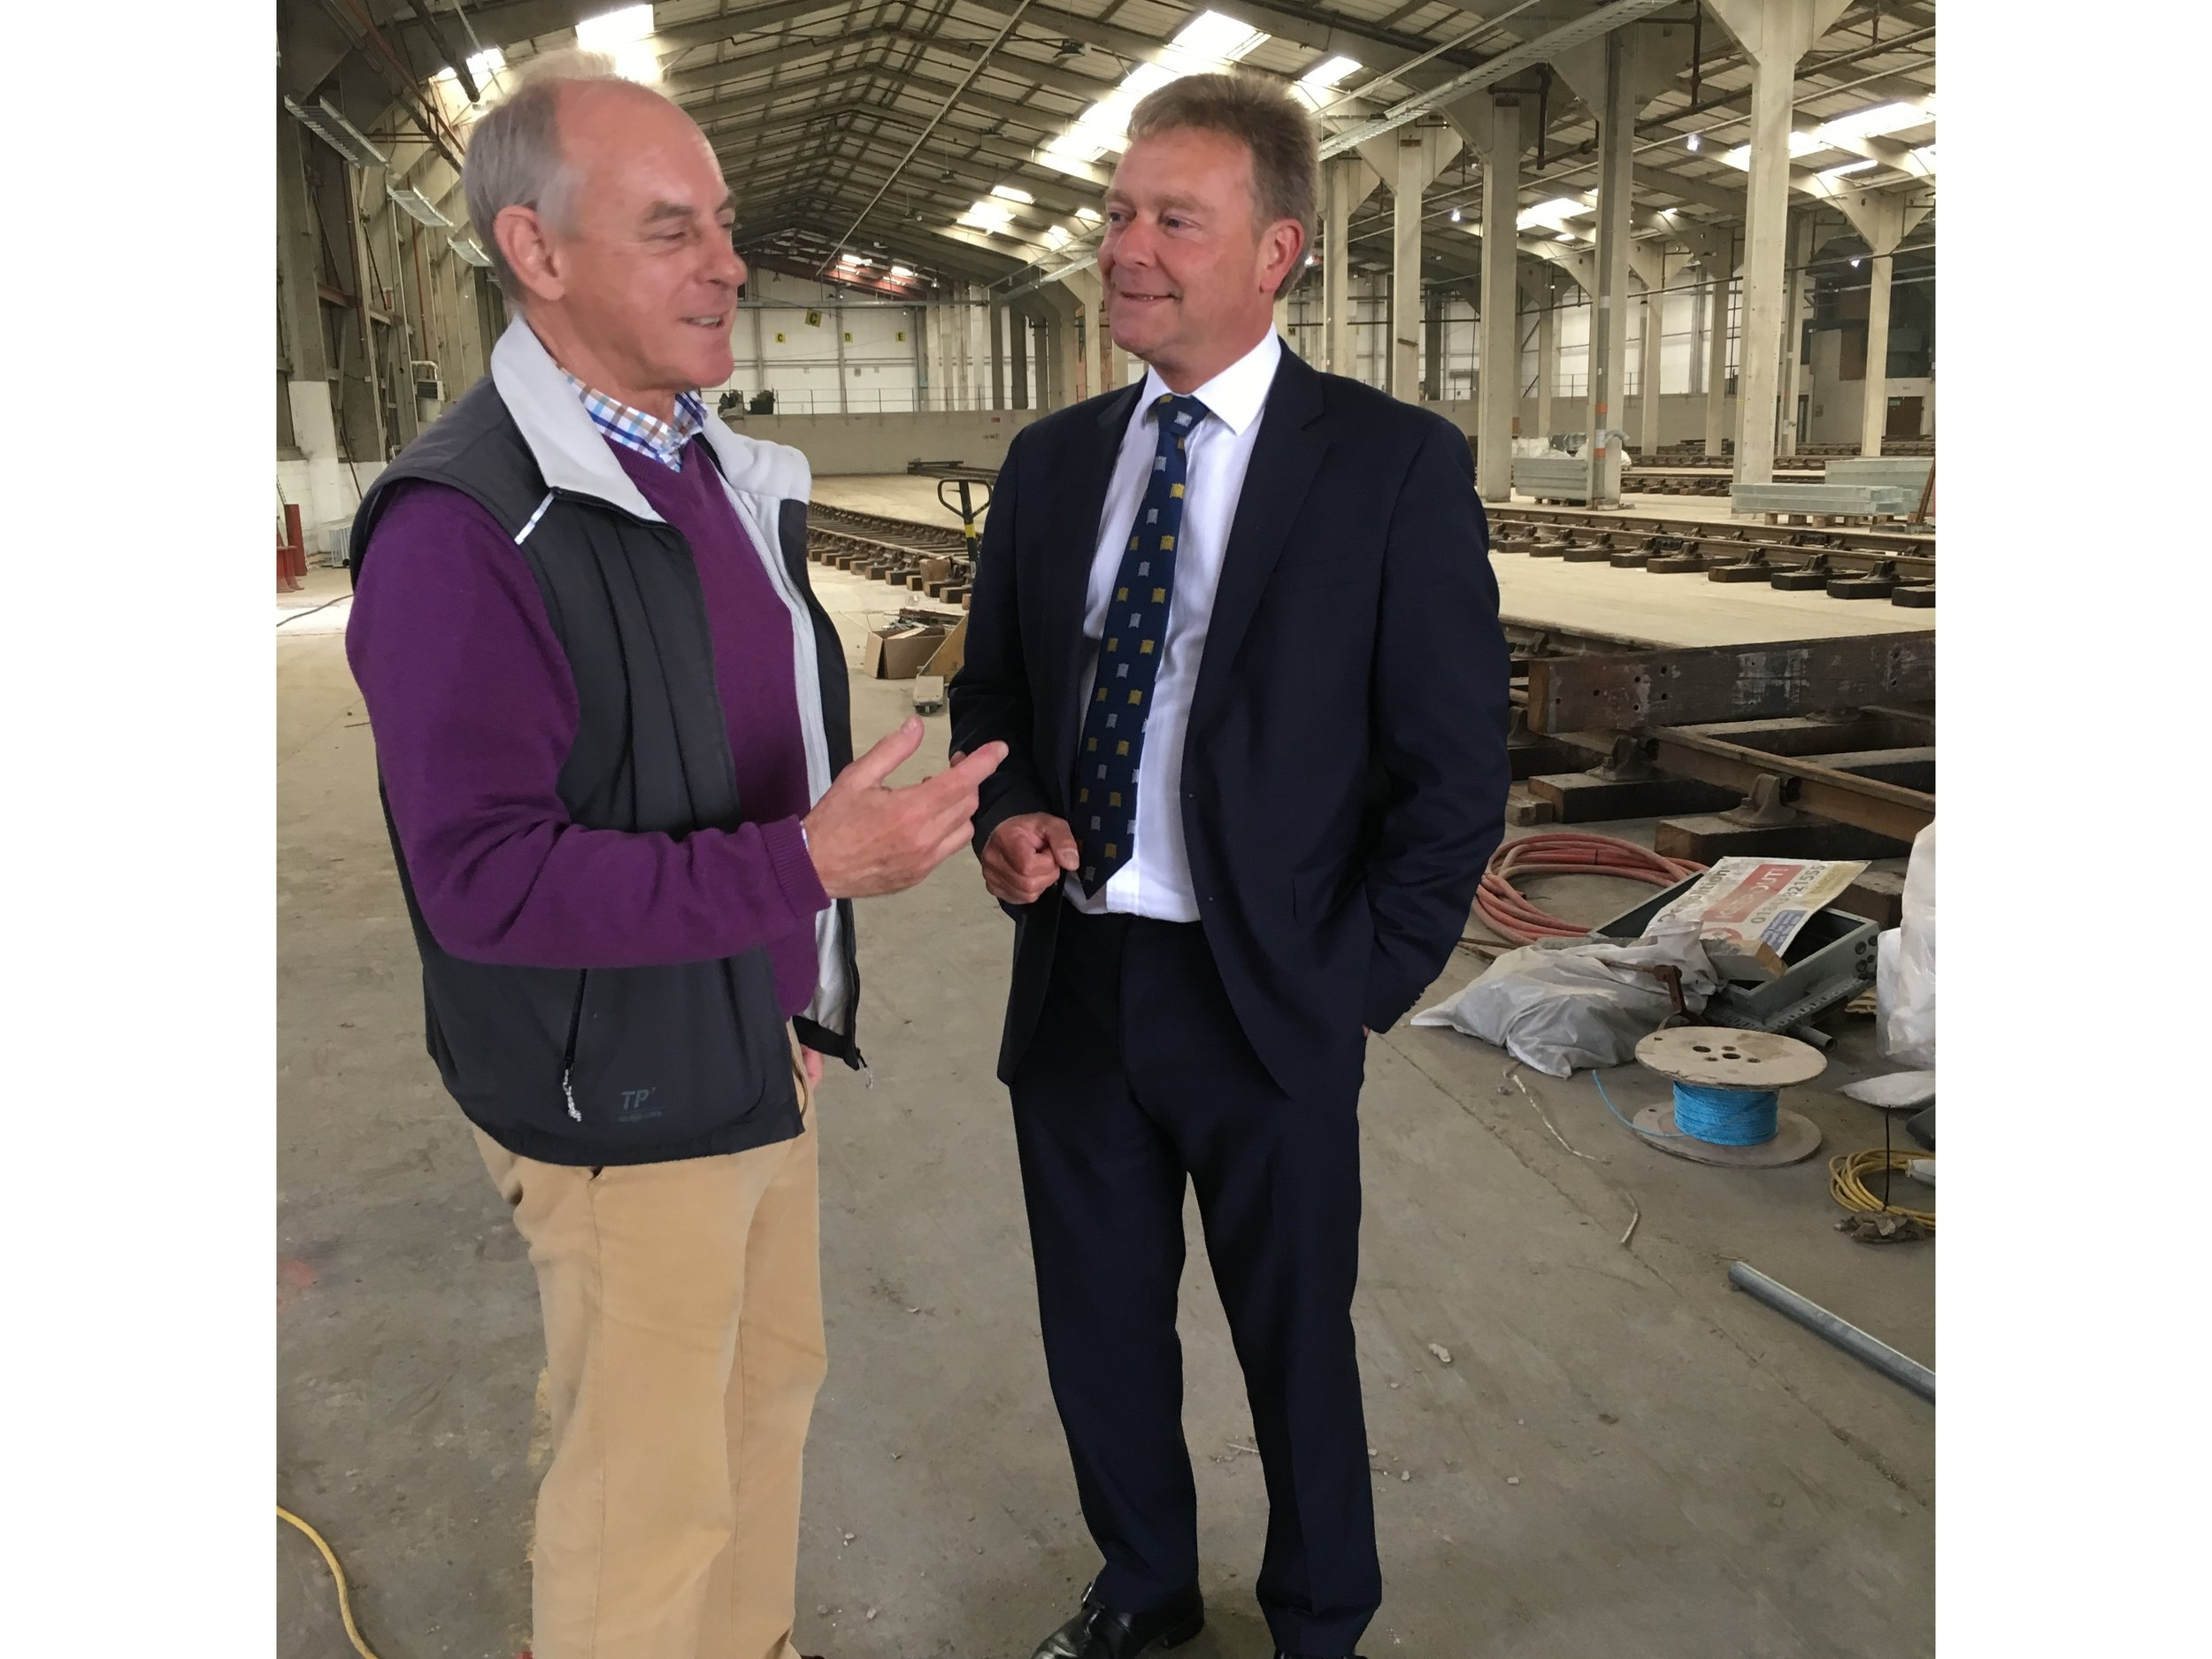 Craig pictured with Locomotive Storage Director, Frank Martin.